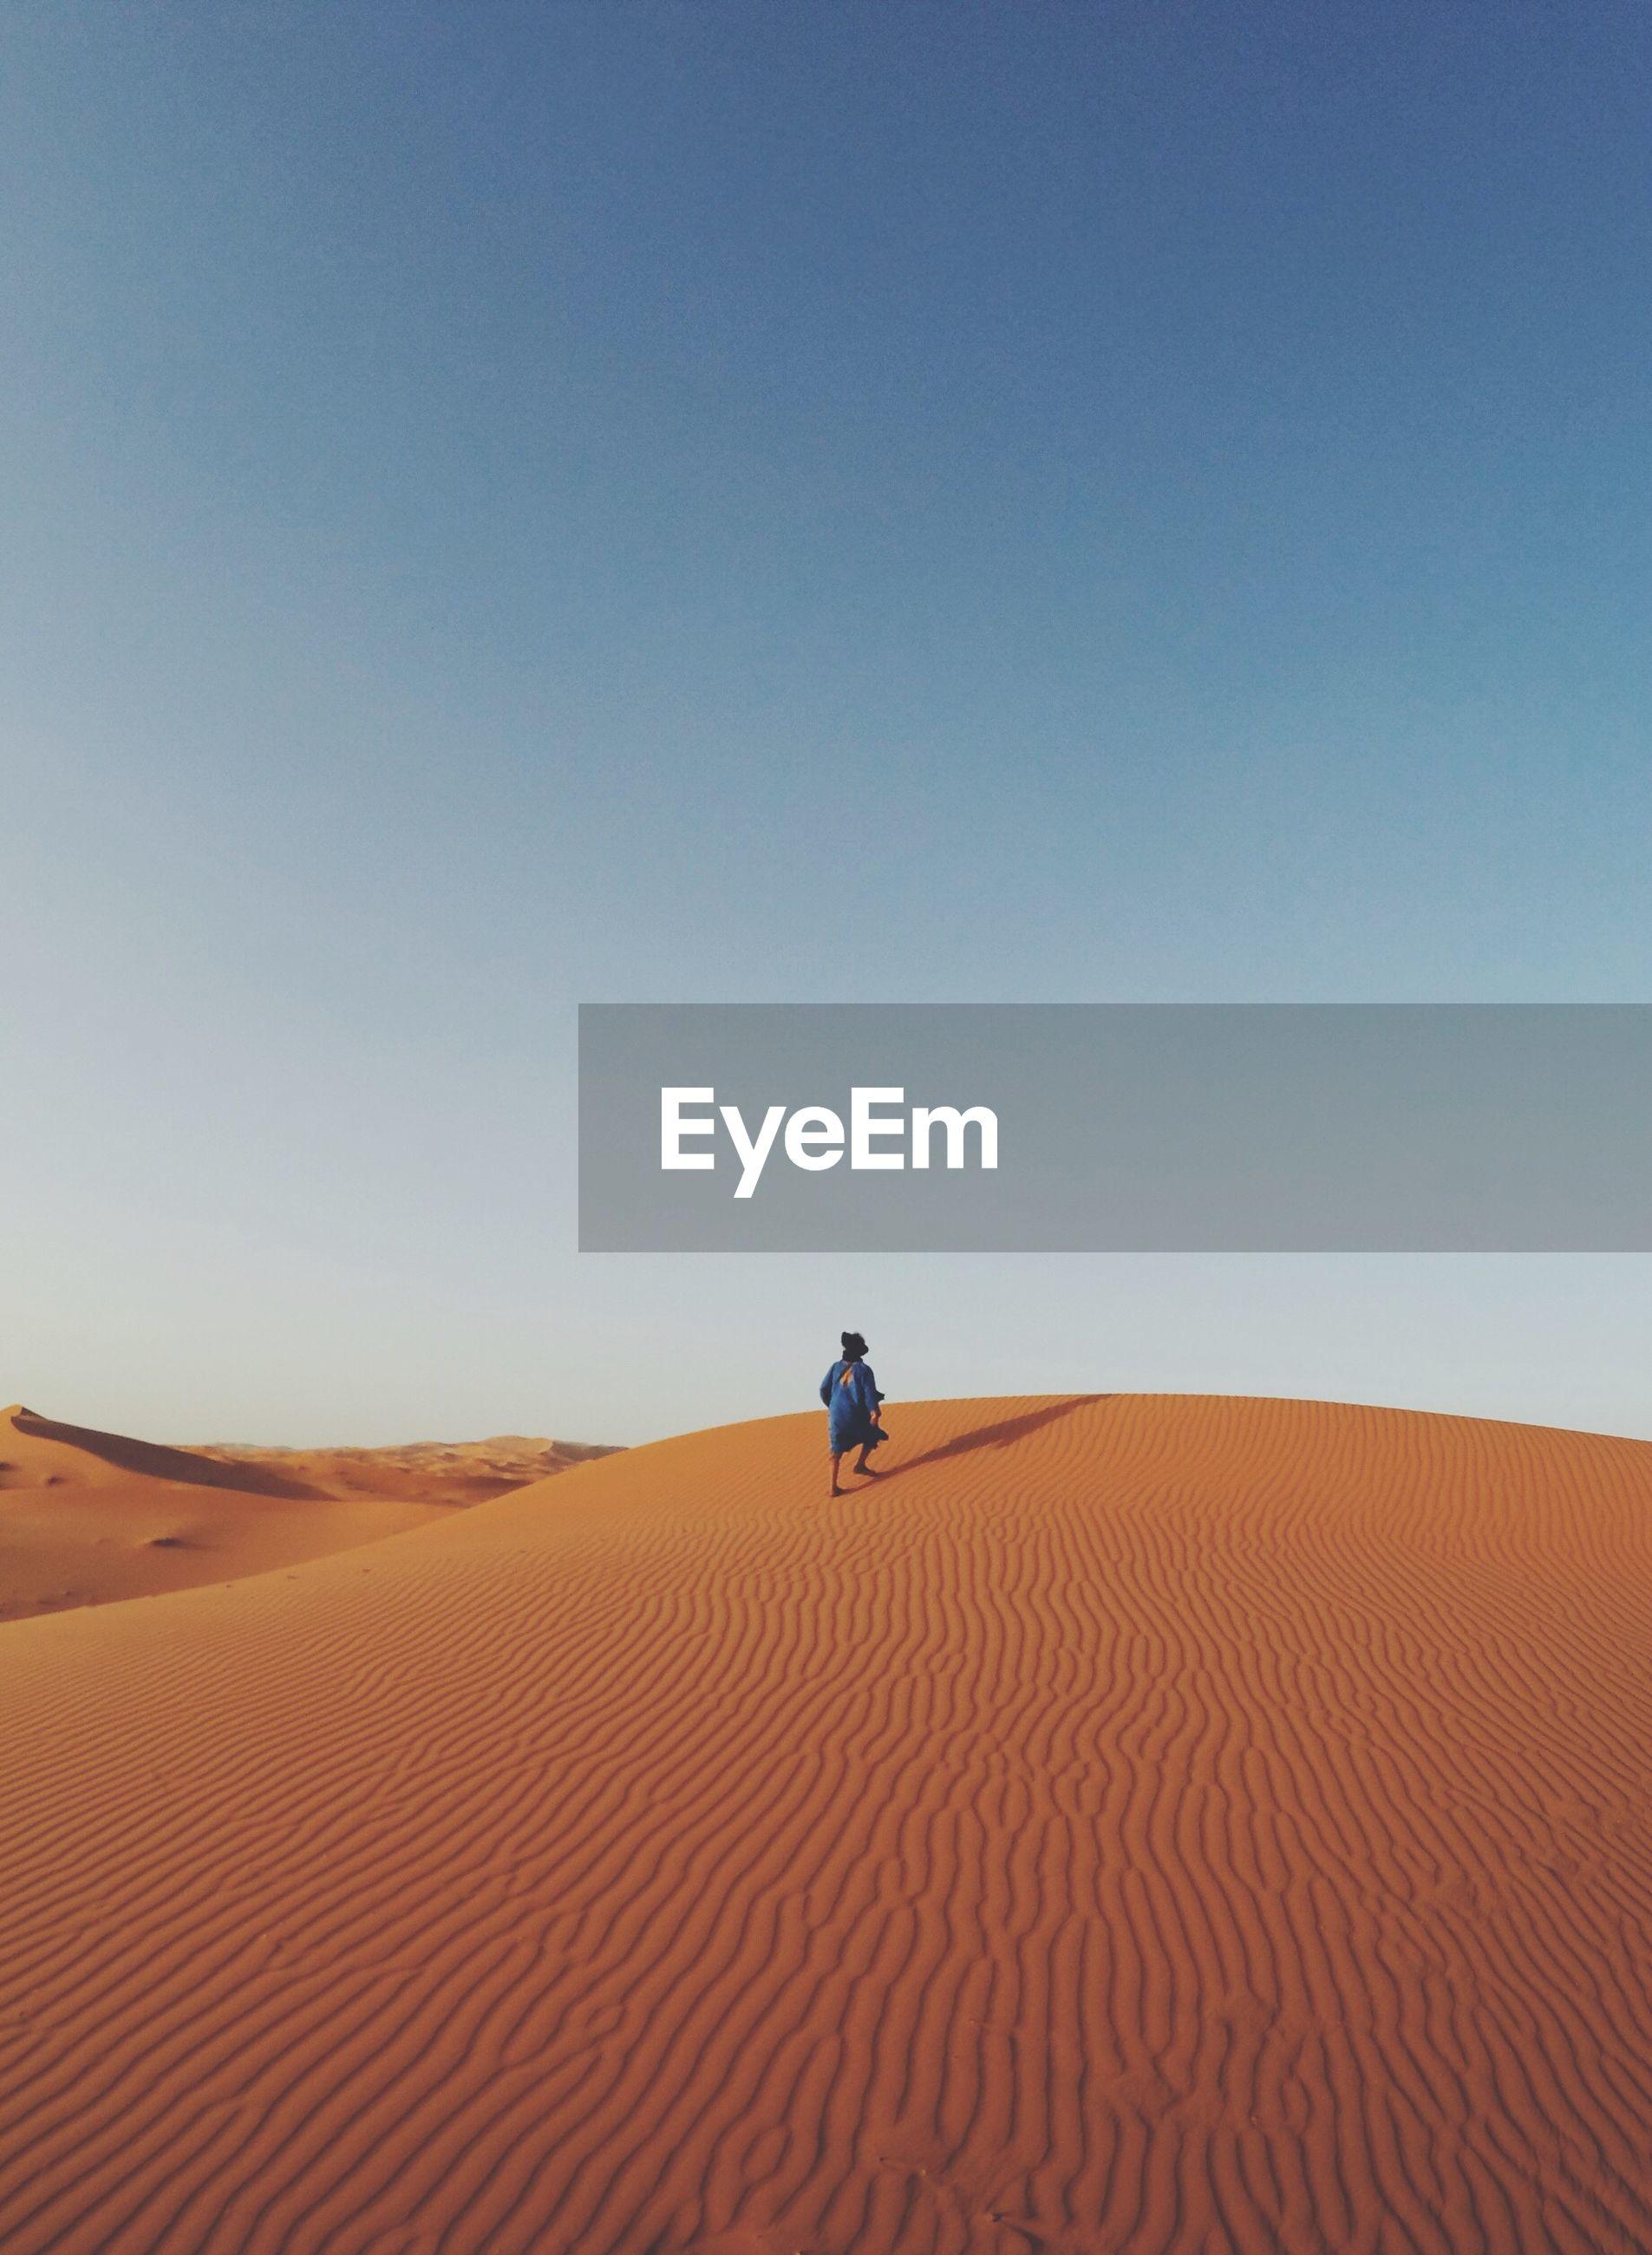 Man walking in desert against clear blue sky